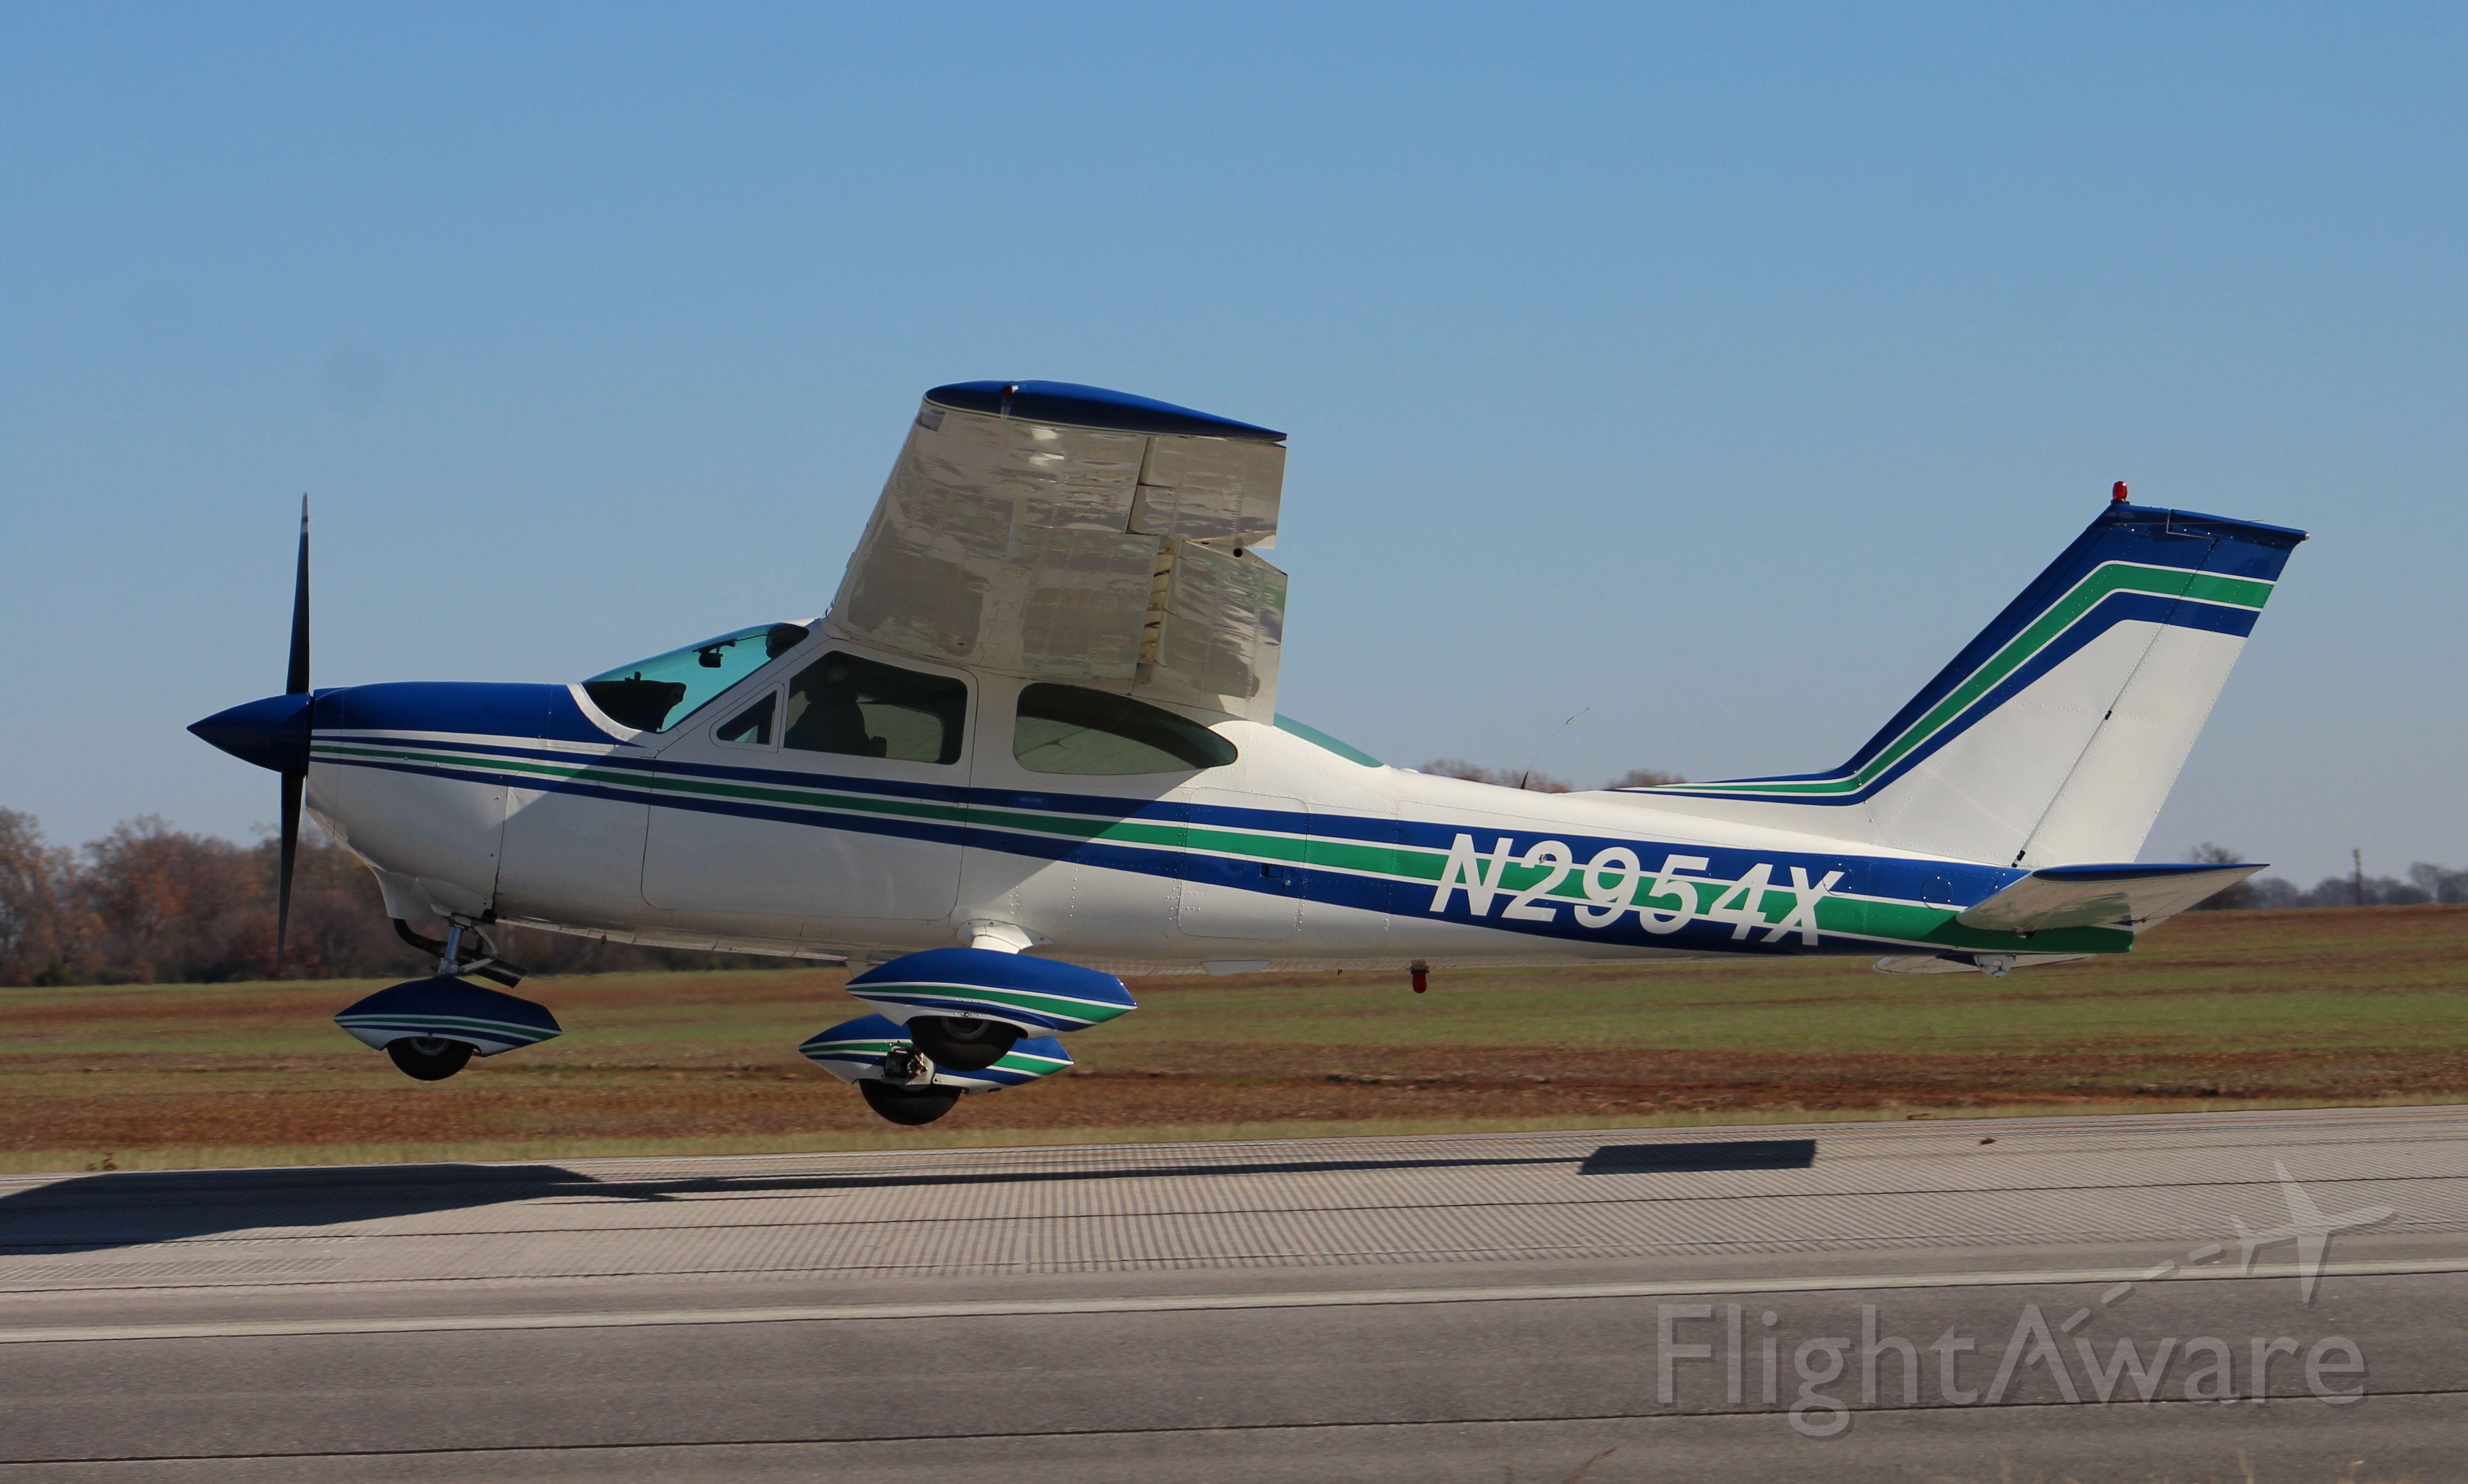 Cessna Cardinal (N2954X) - A Cessna 177 Cardinal departing Runway 36 at Pryor Field Regional Airport, Decatur, AL - December 10, 2016.